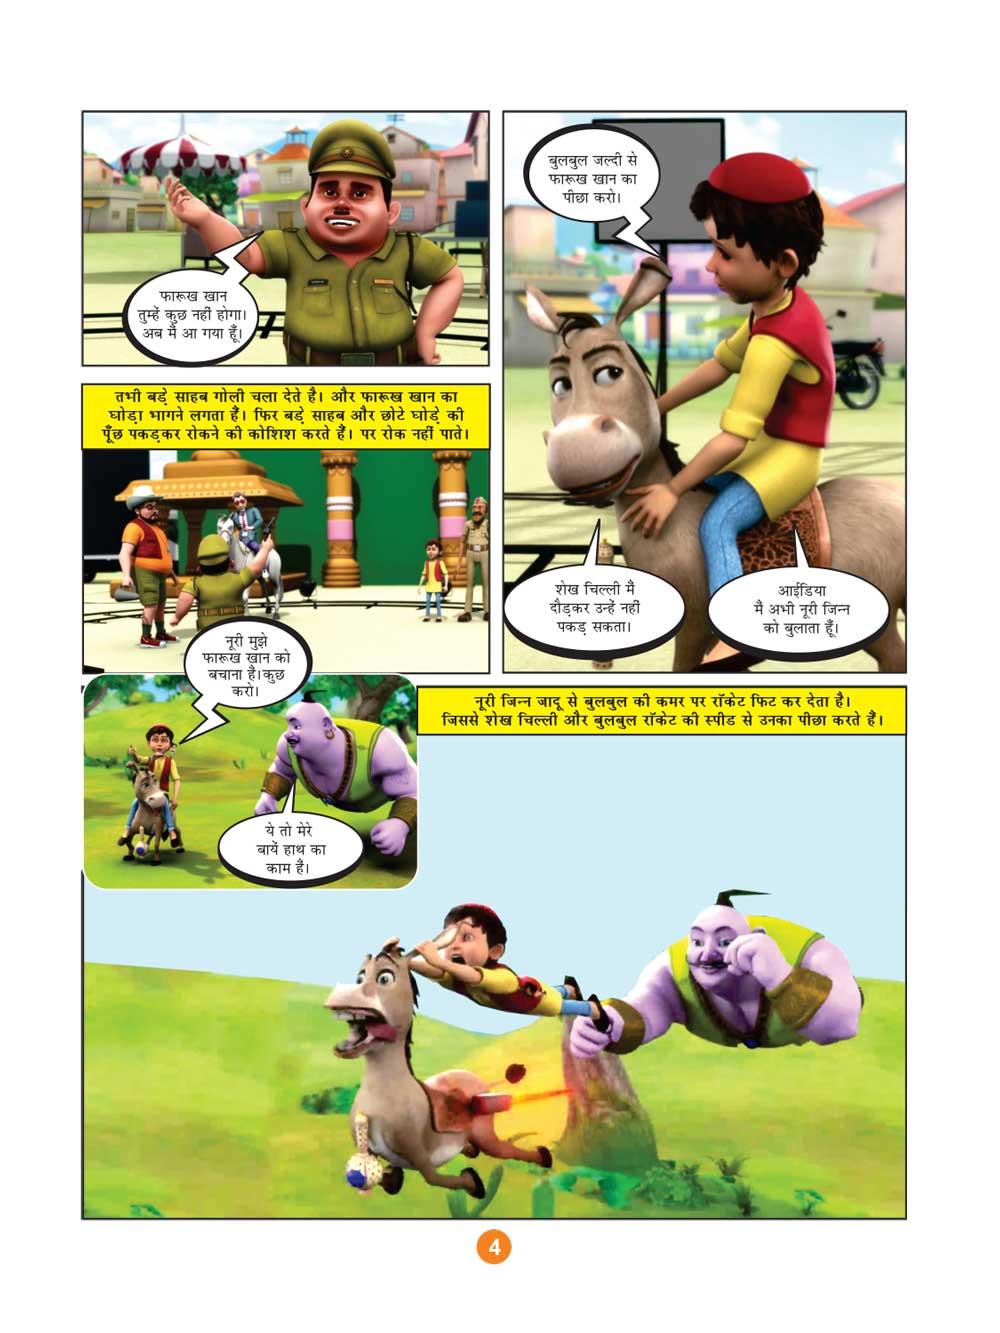 Lotpot Comic: Sheikh Chilli and Aur Farrukh Khan